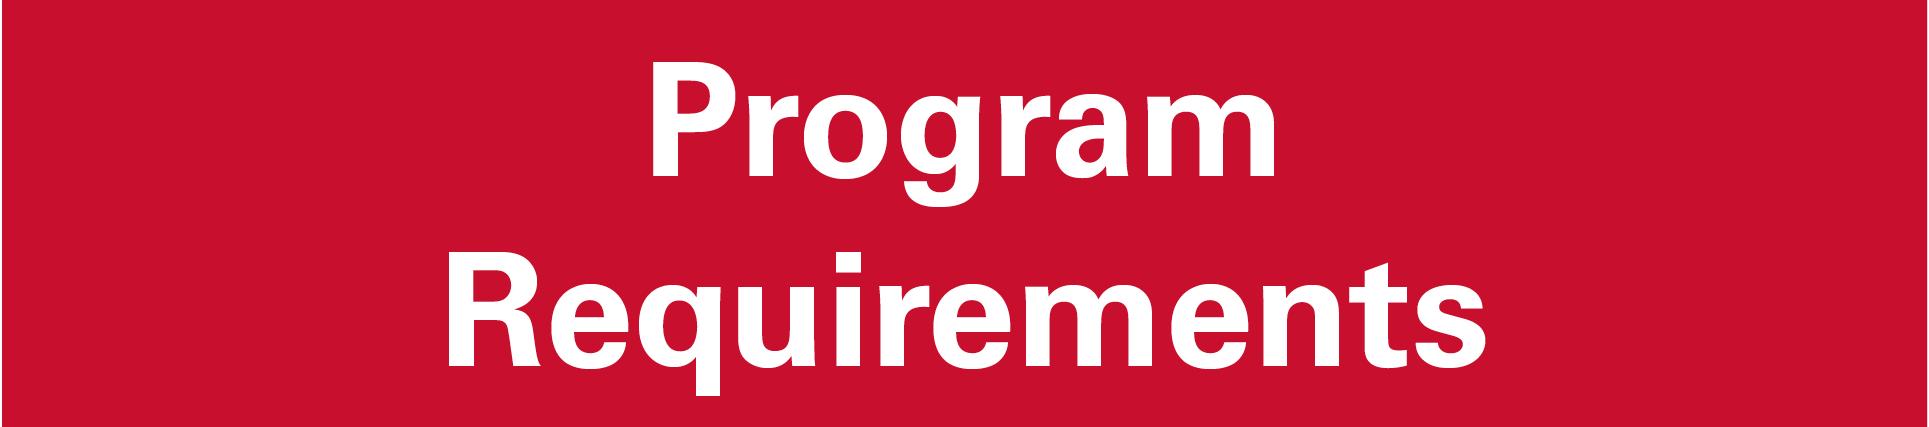 Program Requirements2